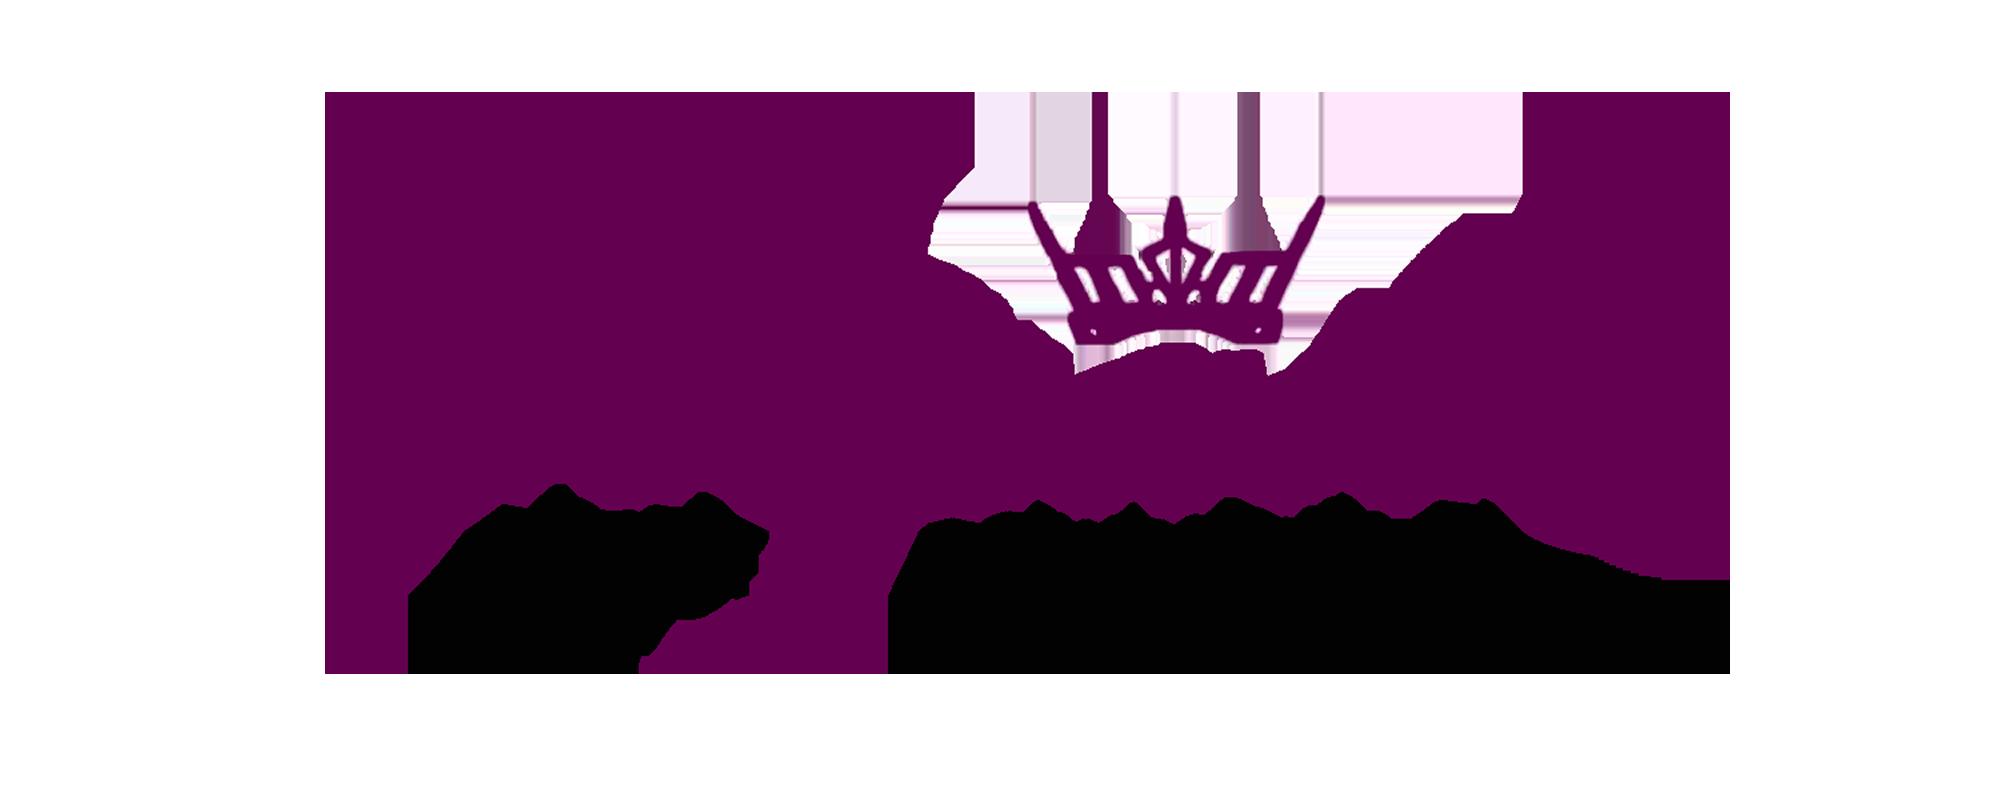 Elegent Nail & Beauty Supply -www.ElegantNailSupply.com